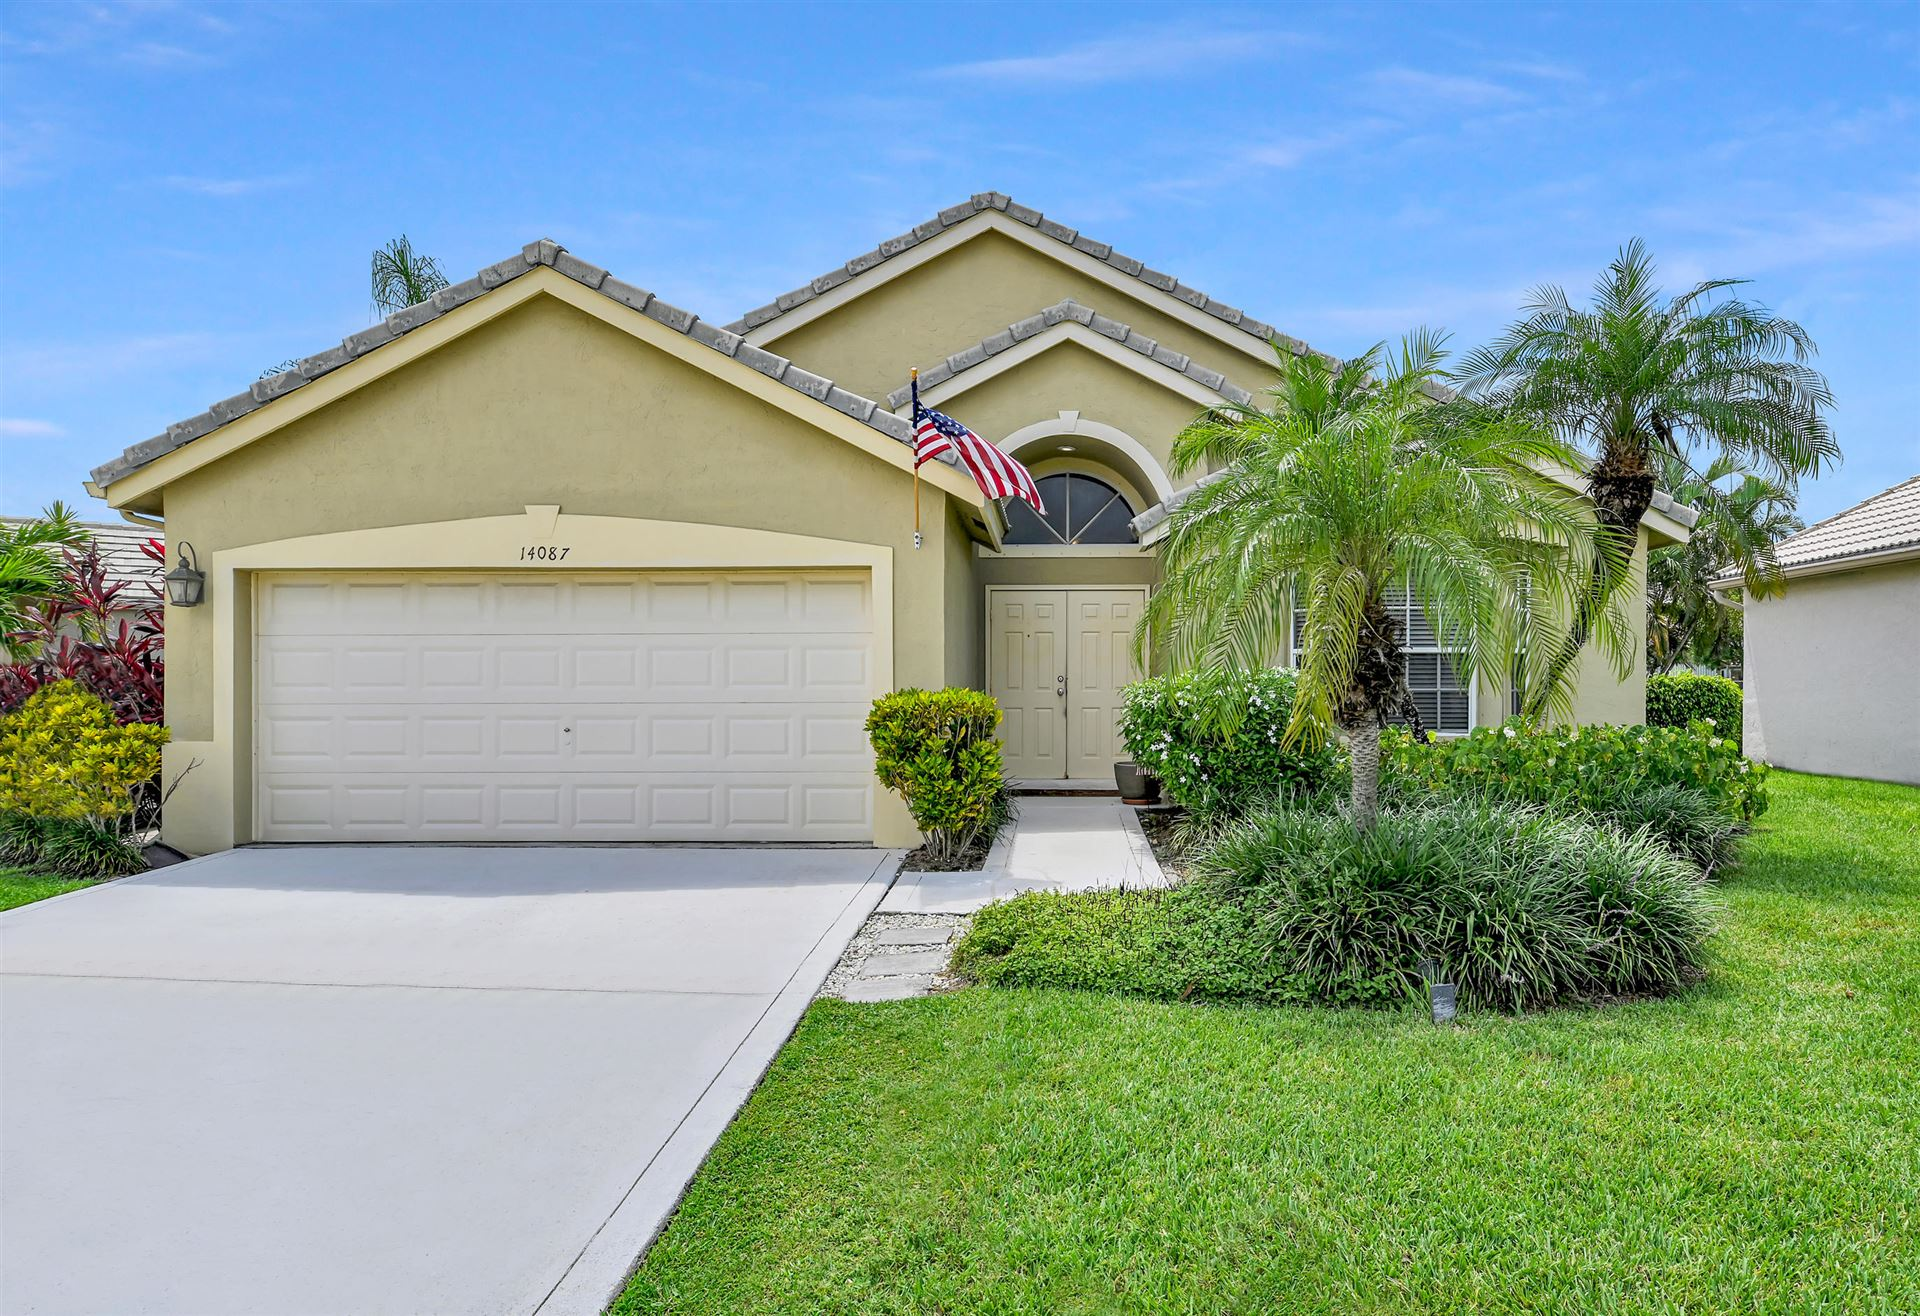 14087 Glenlyon Court, Delray Beach, FL 33446 - MLS#: RX-10730549